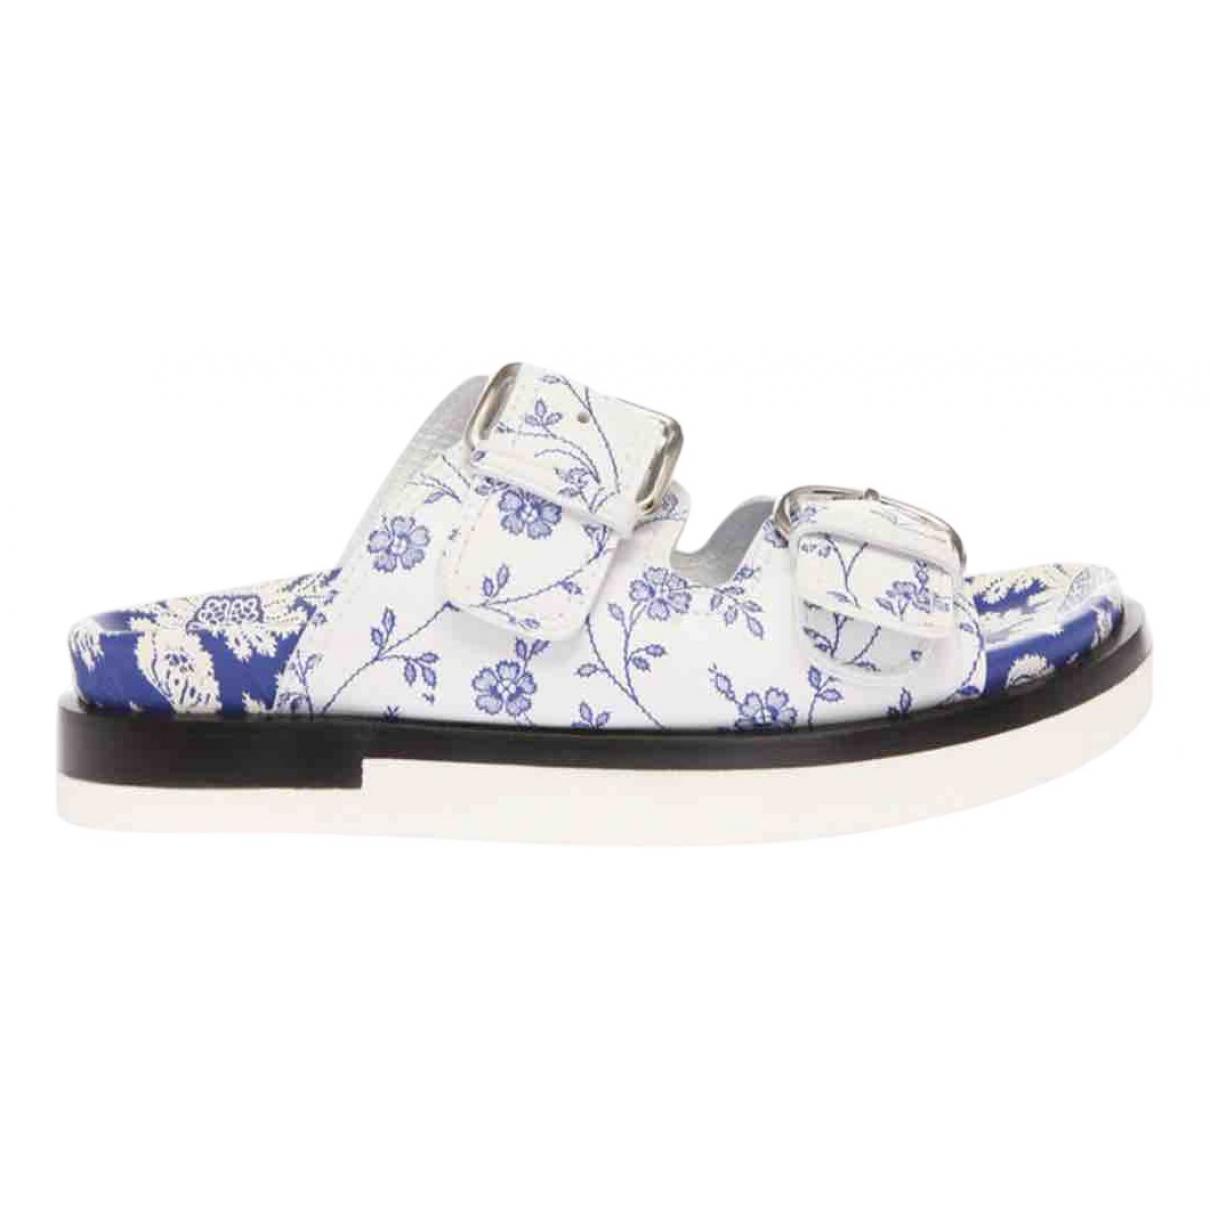 Alexander Mcqueen \N White Leather Sandals for Women 38 EU